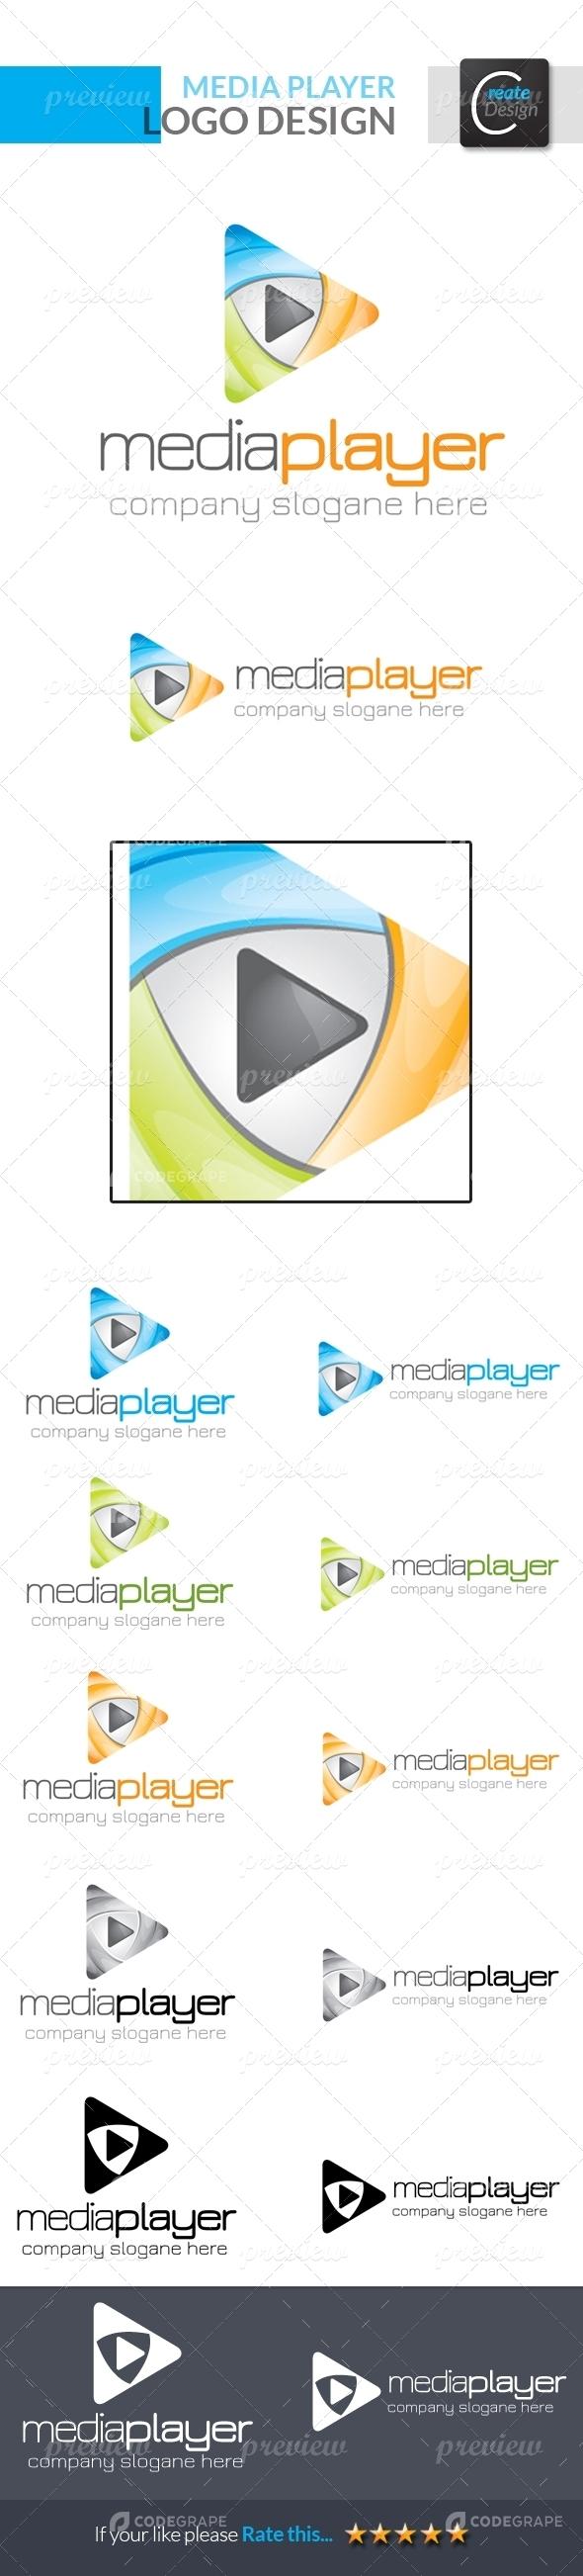 Mediaplayer Logo Templates